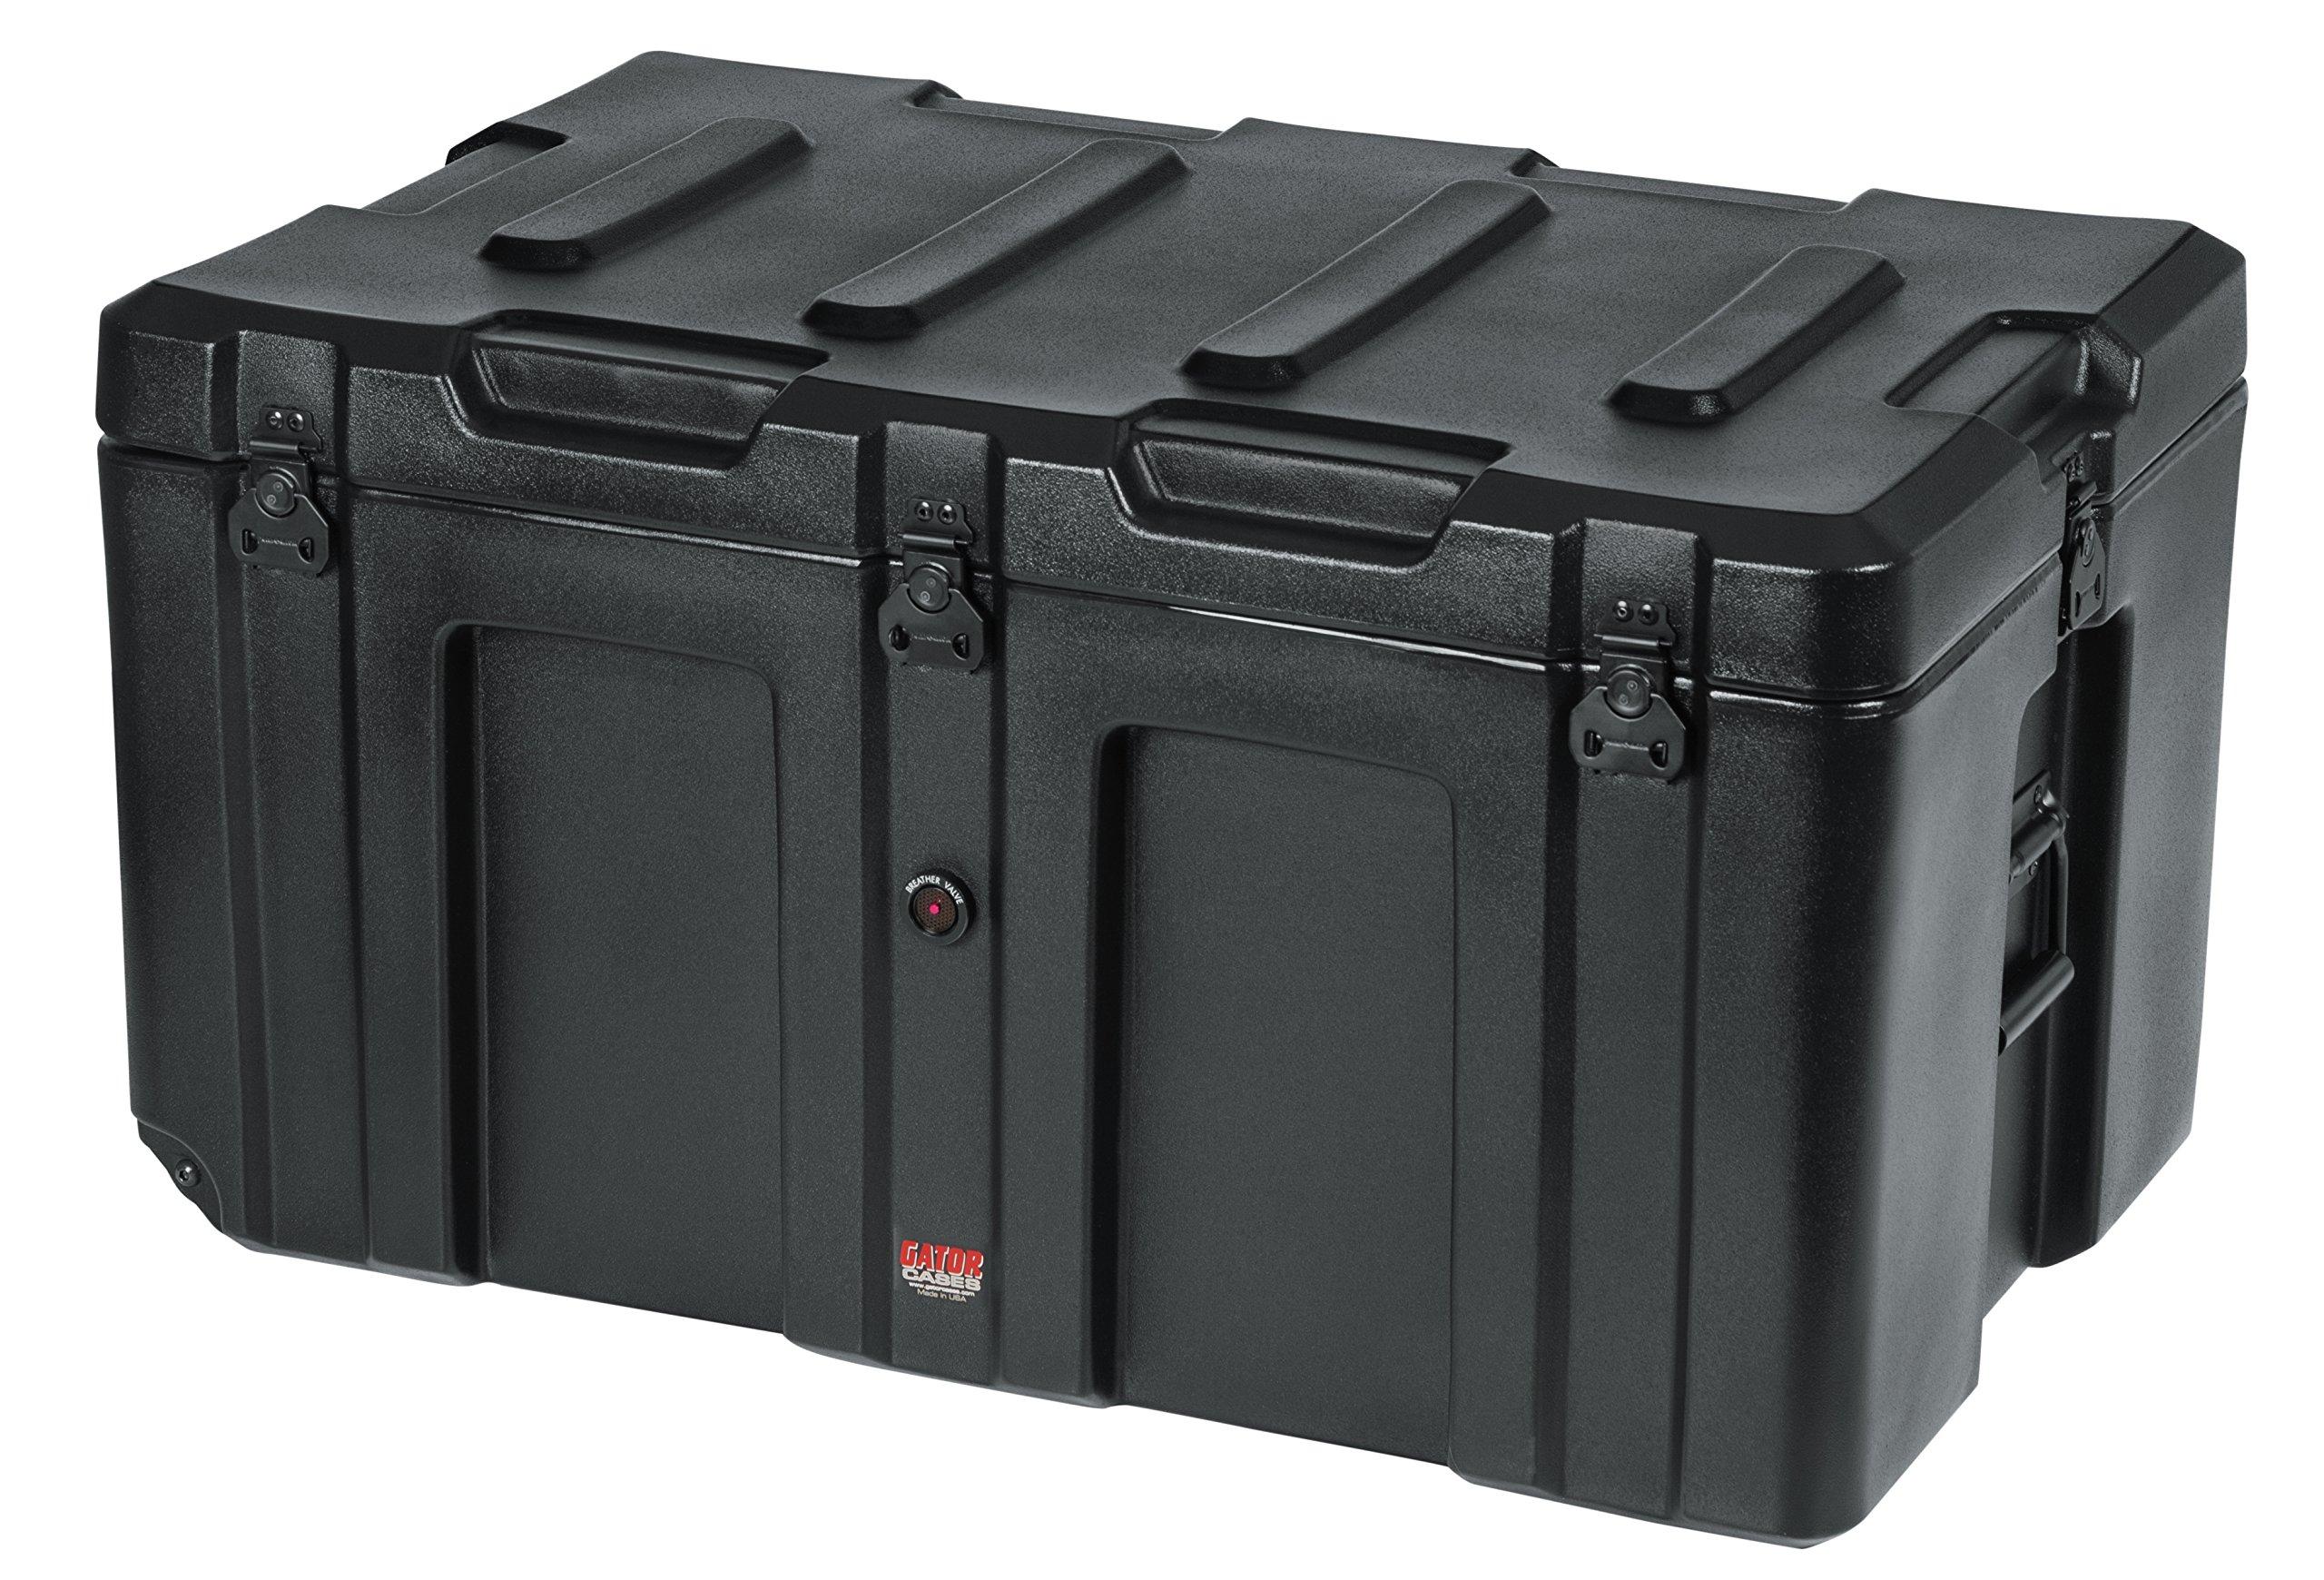 Gator Cases GXR-3219-1603 ATA Roto-Molded Utility Case, 32'' x 19'' x 19'' Interior